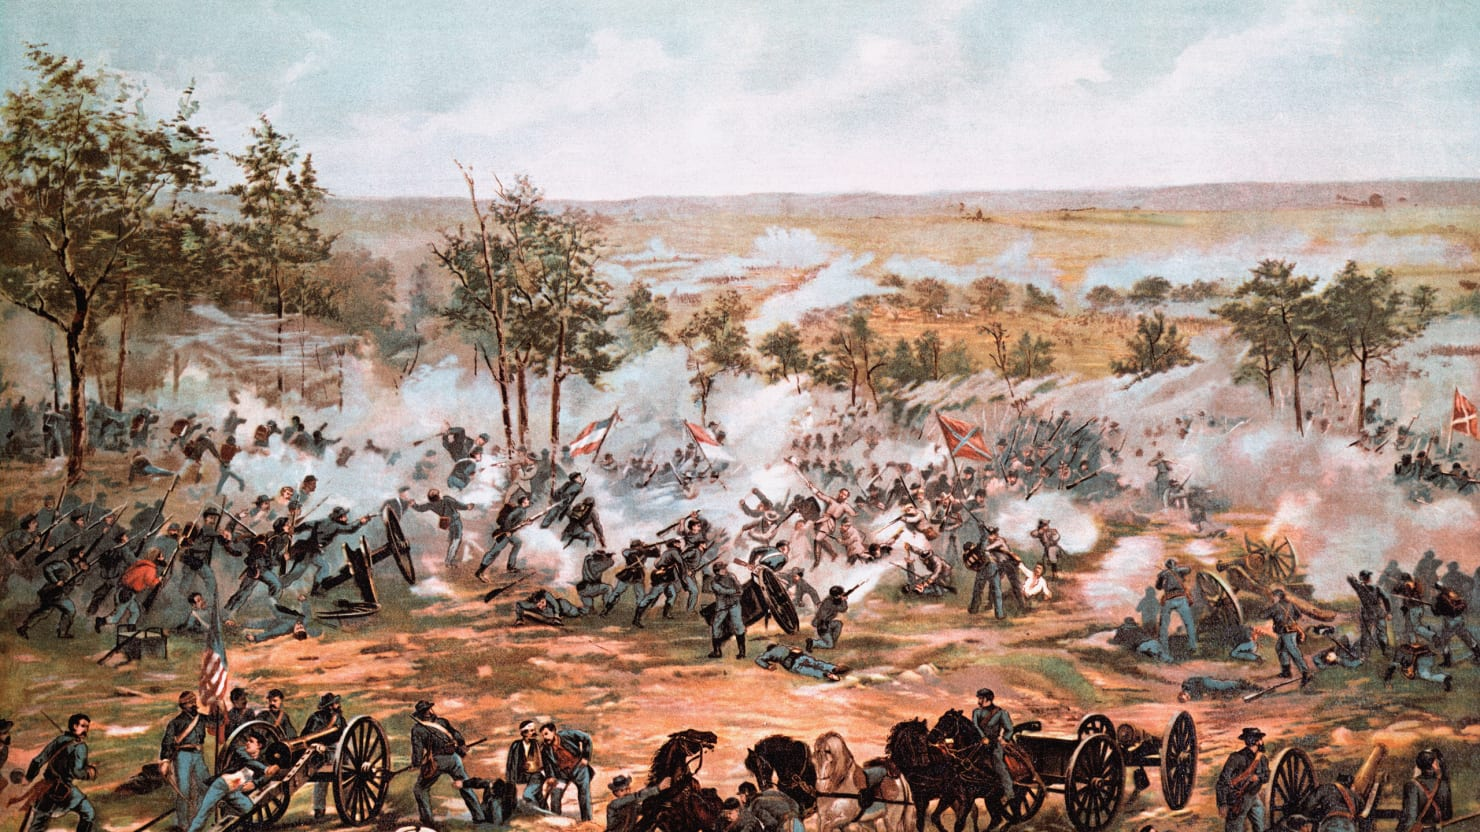 annotation on civil war Civil war timeline civil war timeline 1861-1865 civil war timeline including civil war events, civil war battles, union victories, confderate victories.